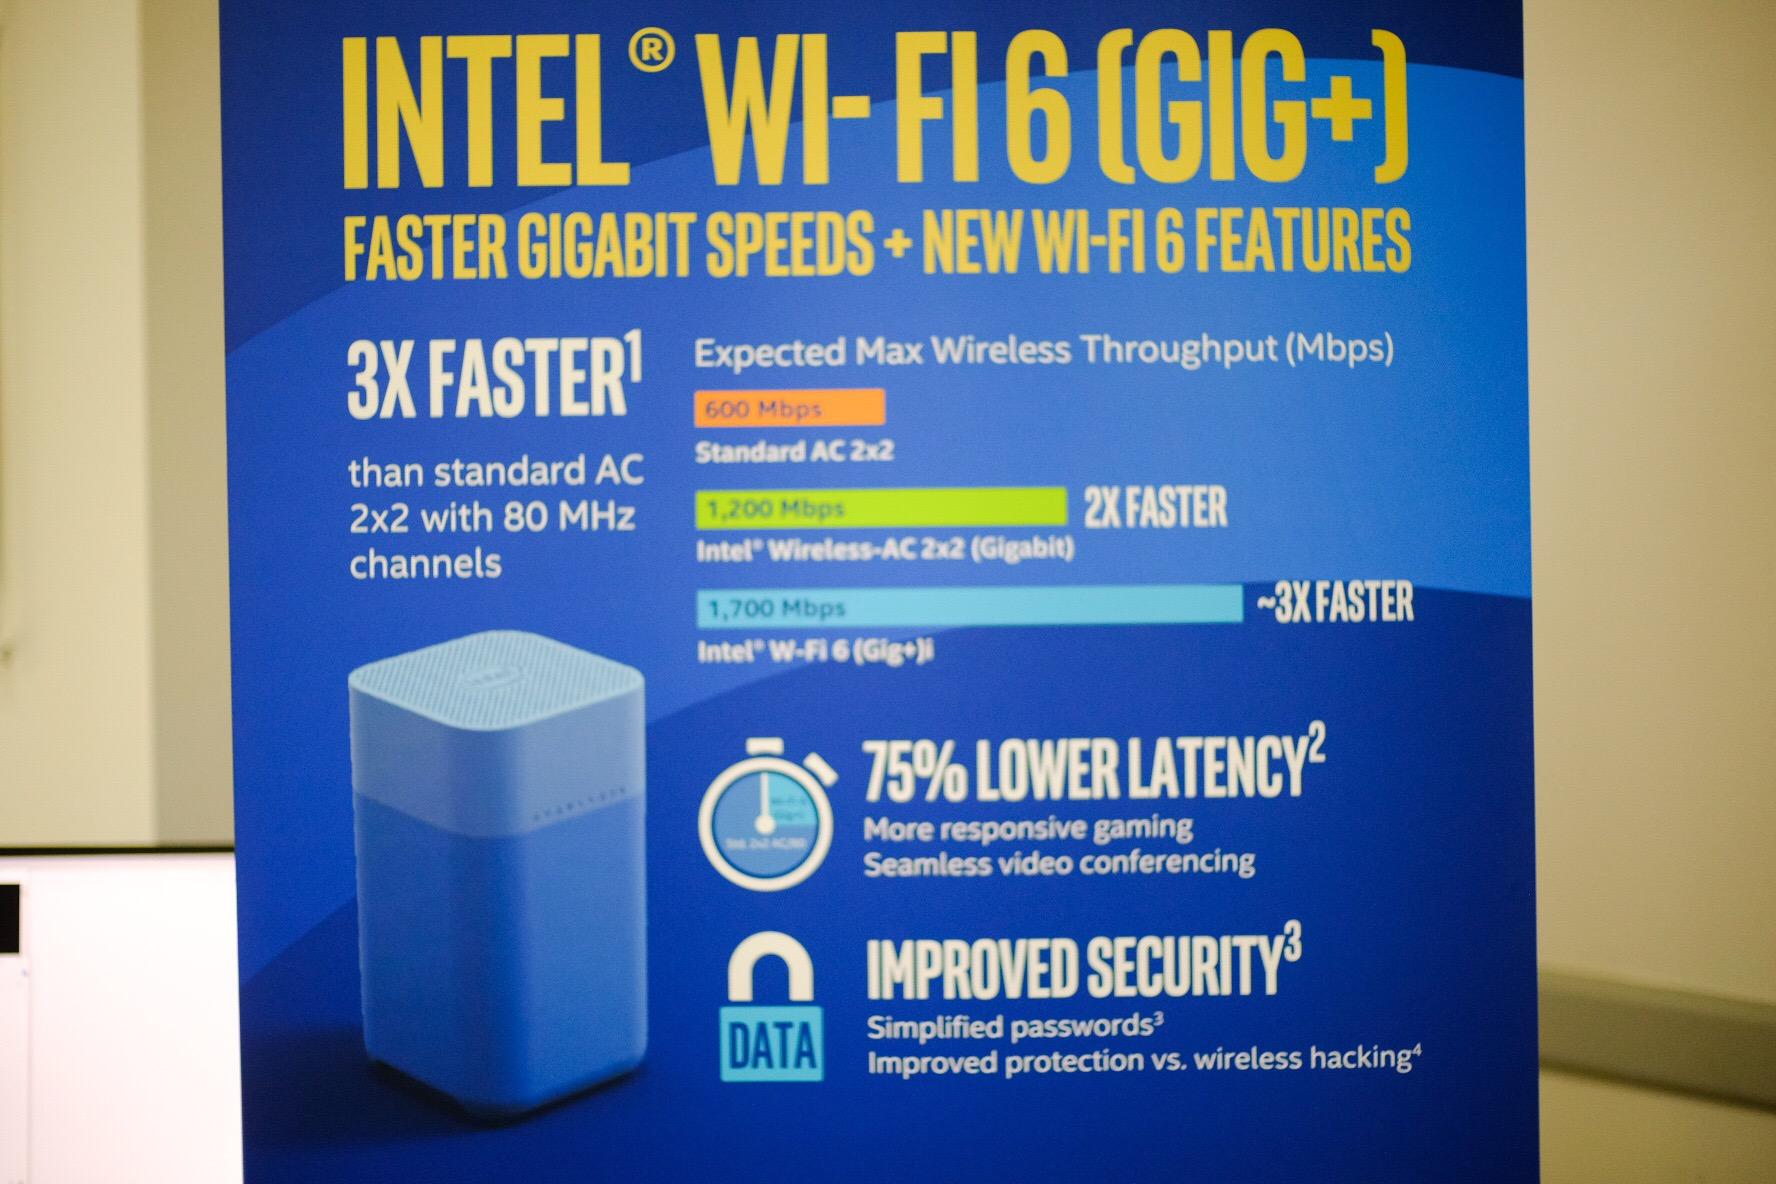 http://www.coolaler.com.tw/coolalercbb/Intel_wifi6/6.JPG